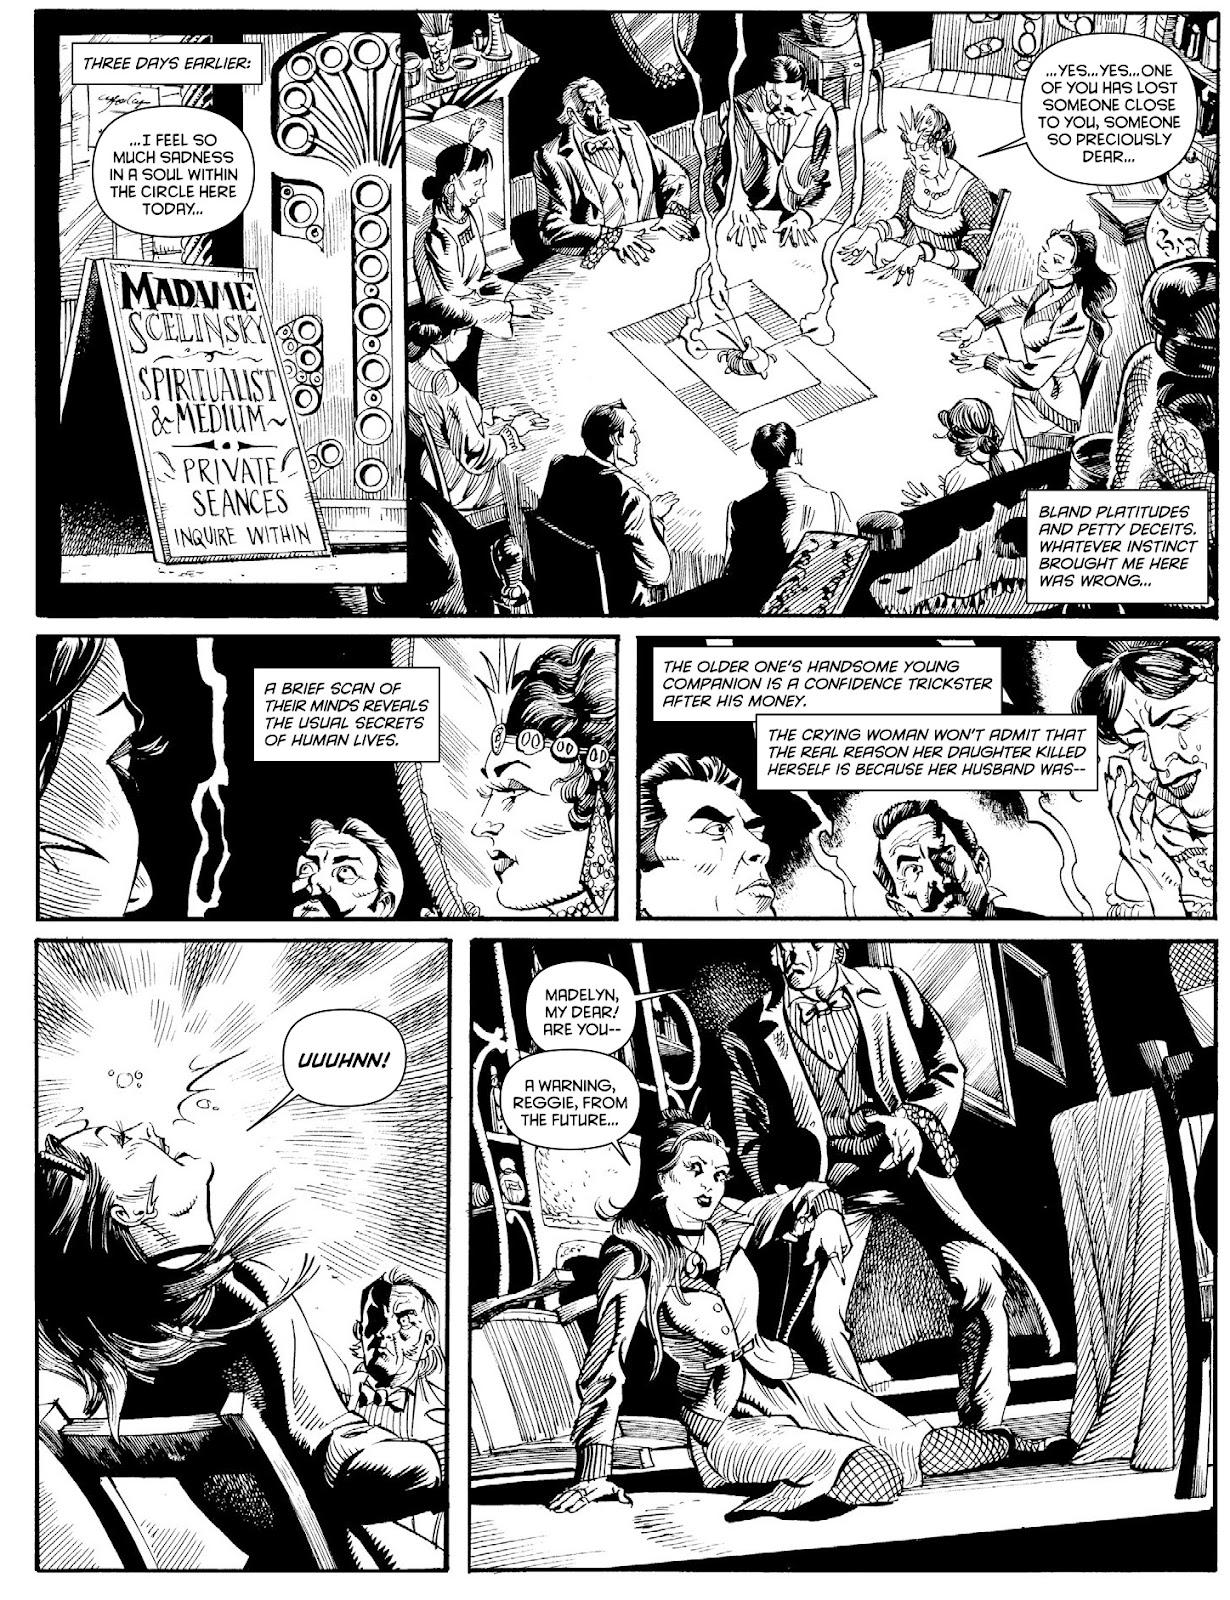 Judge Dredd Megazine (Vol. 5) issue 427 - Page 94